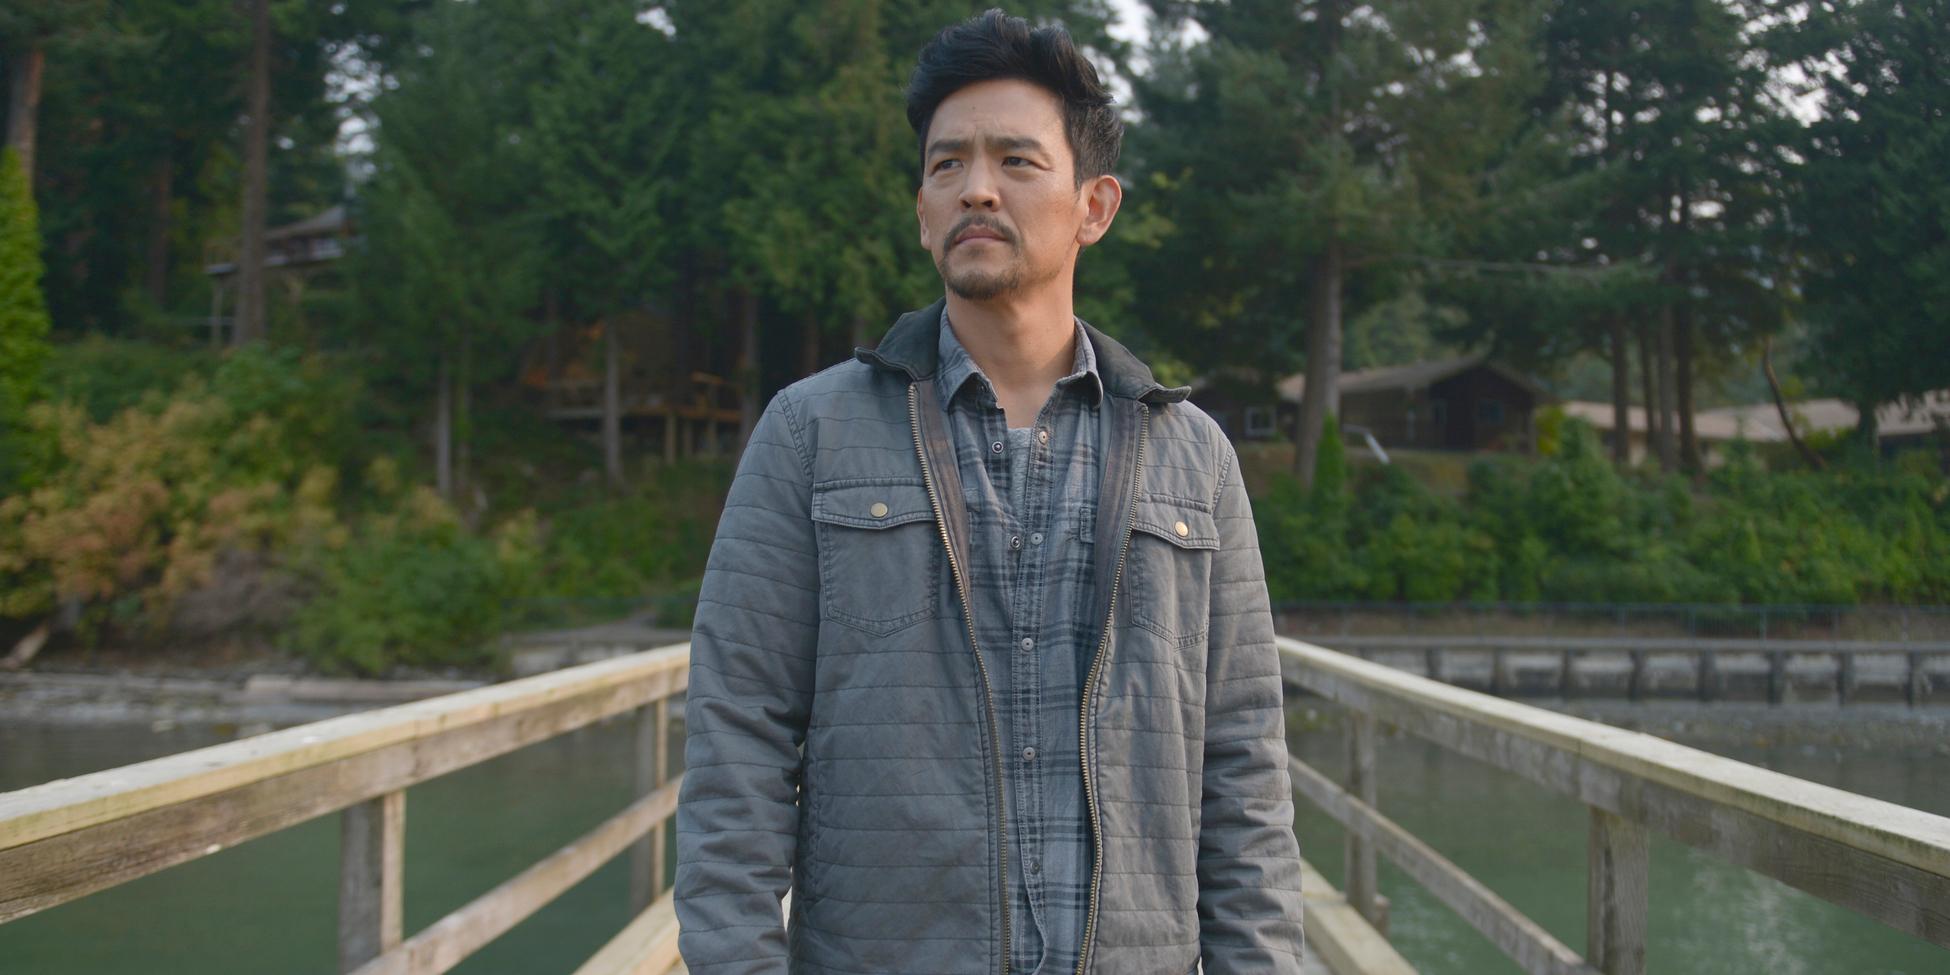 John Cho in The Exorcist Season 2Jon Cho in The Exorcist Season 2